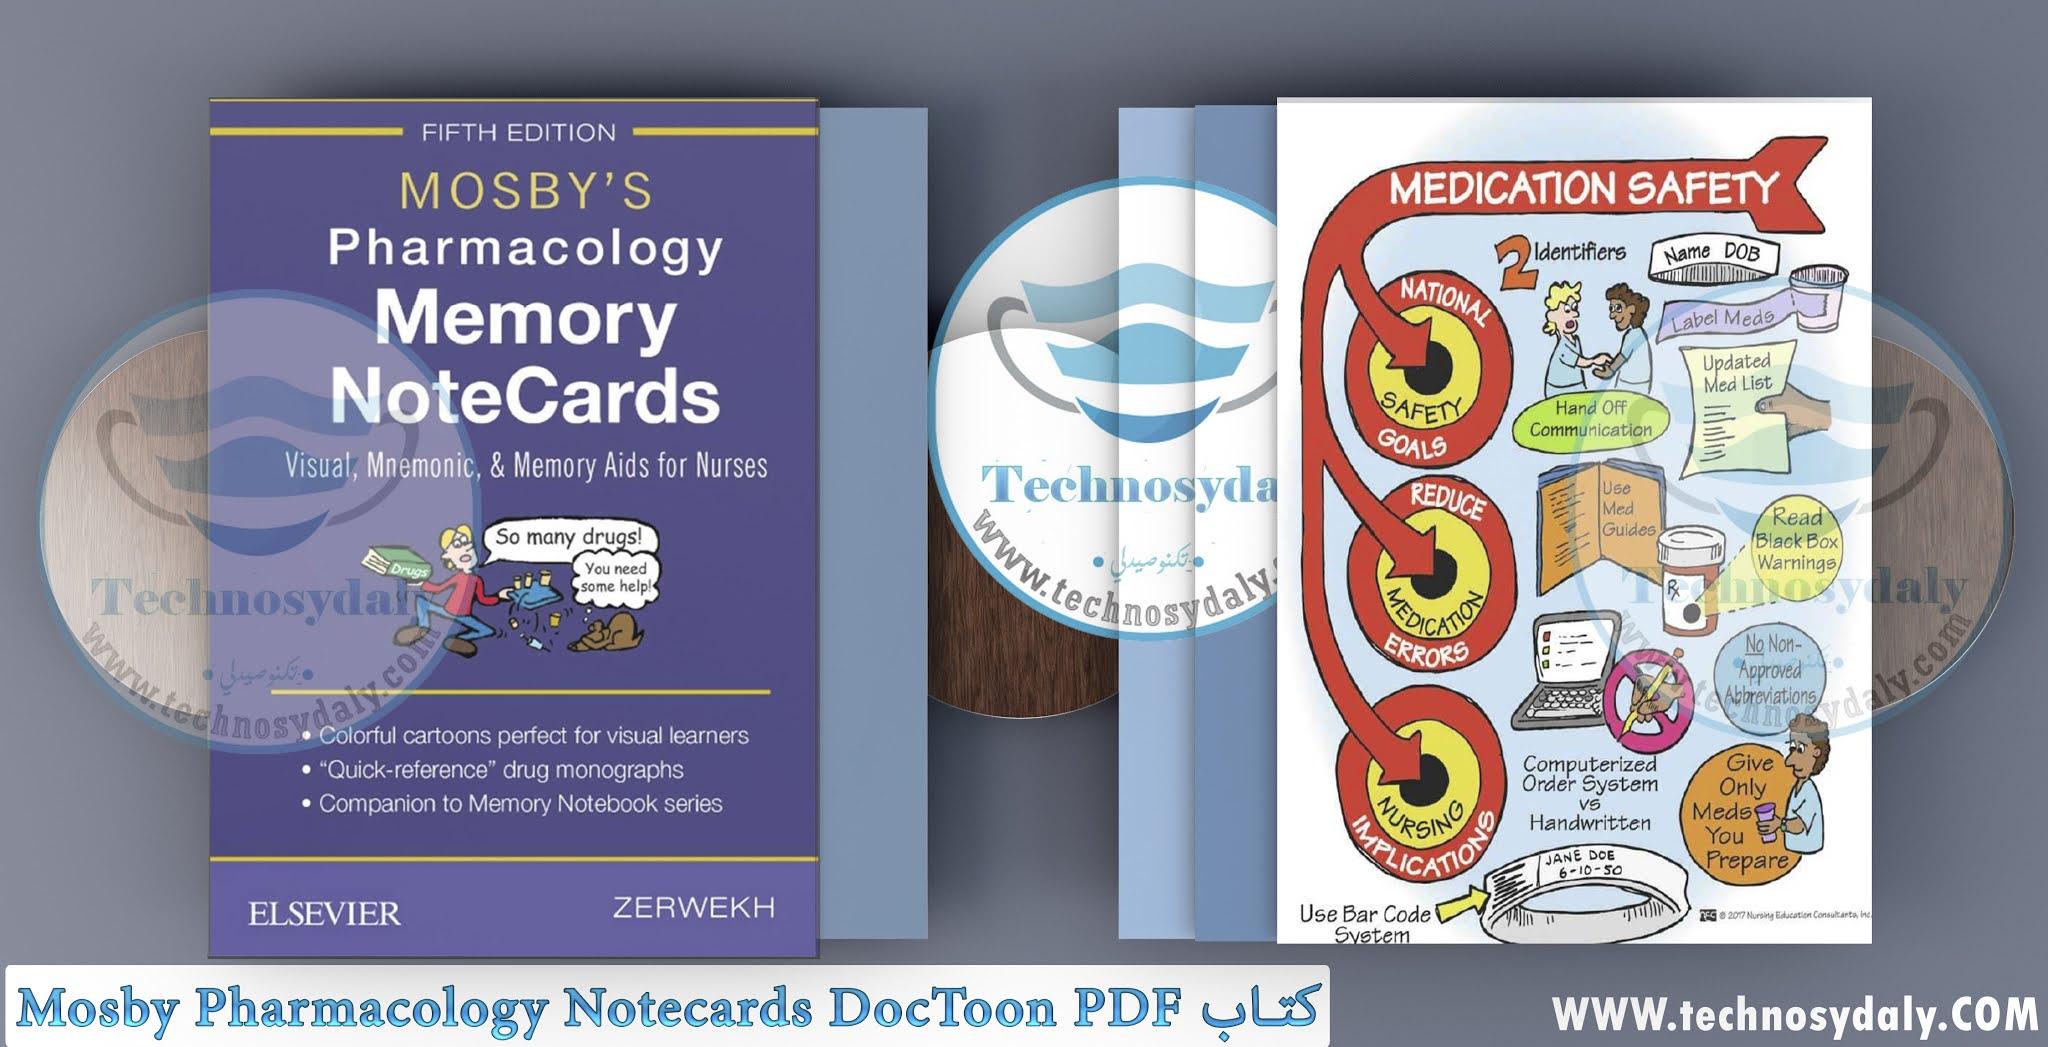 كتاب Mosby Pharmacology Notecards DocToon PDF